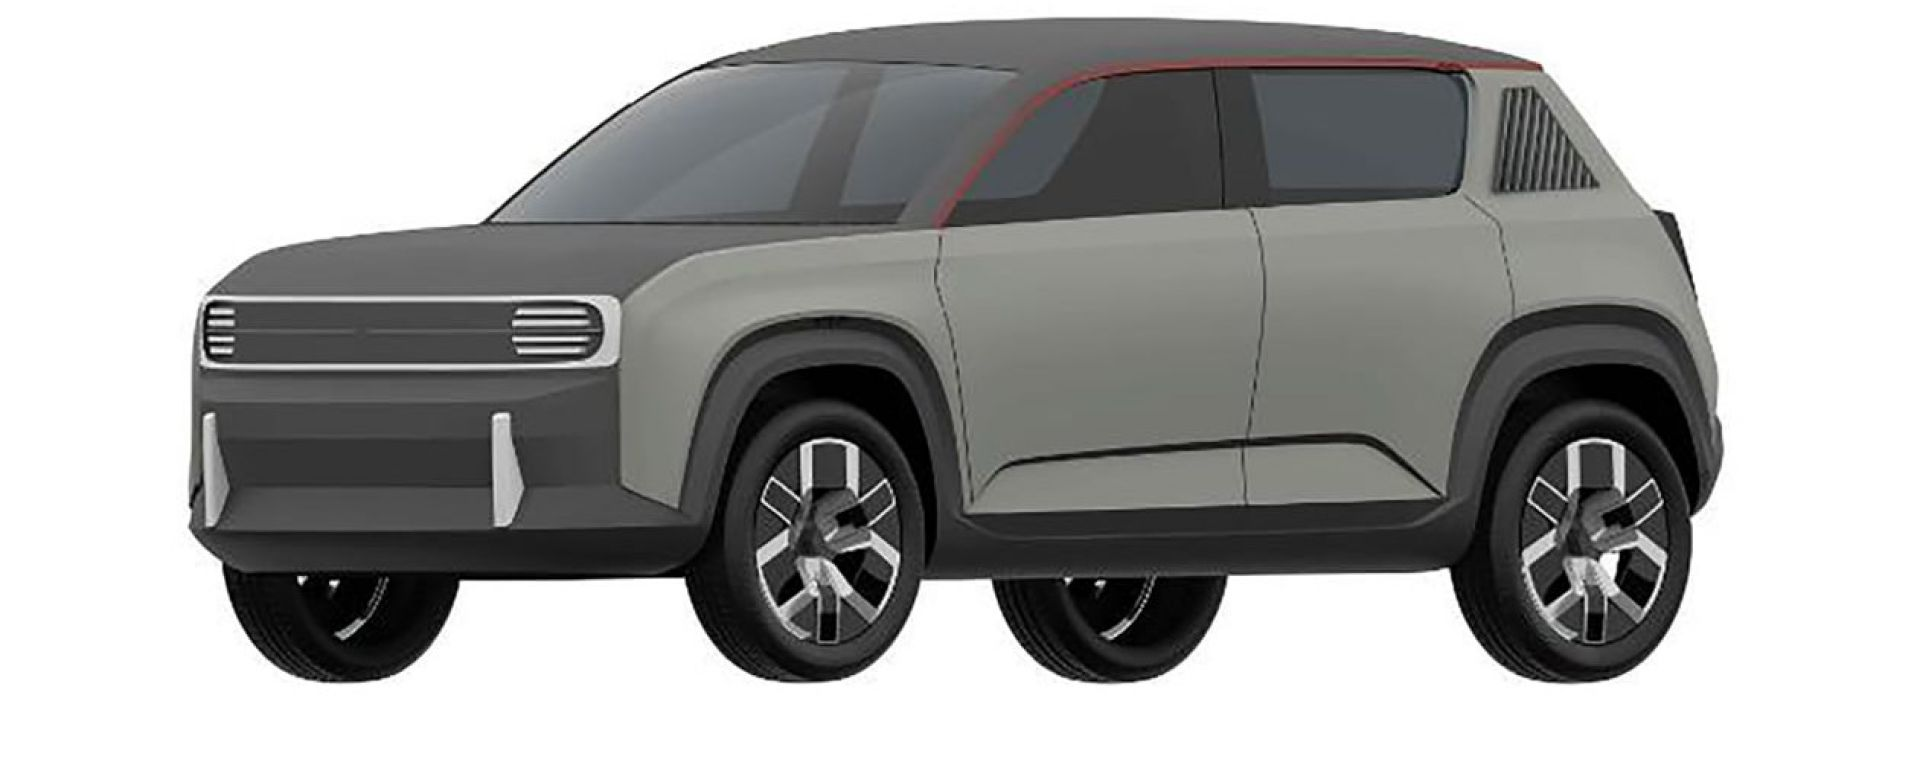 Nuova Renault 4, sfuggono in rete i brevetti